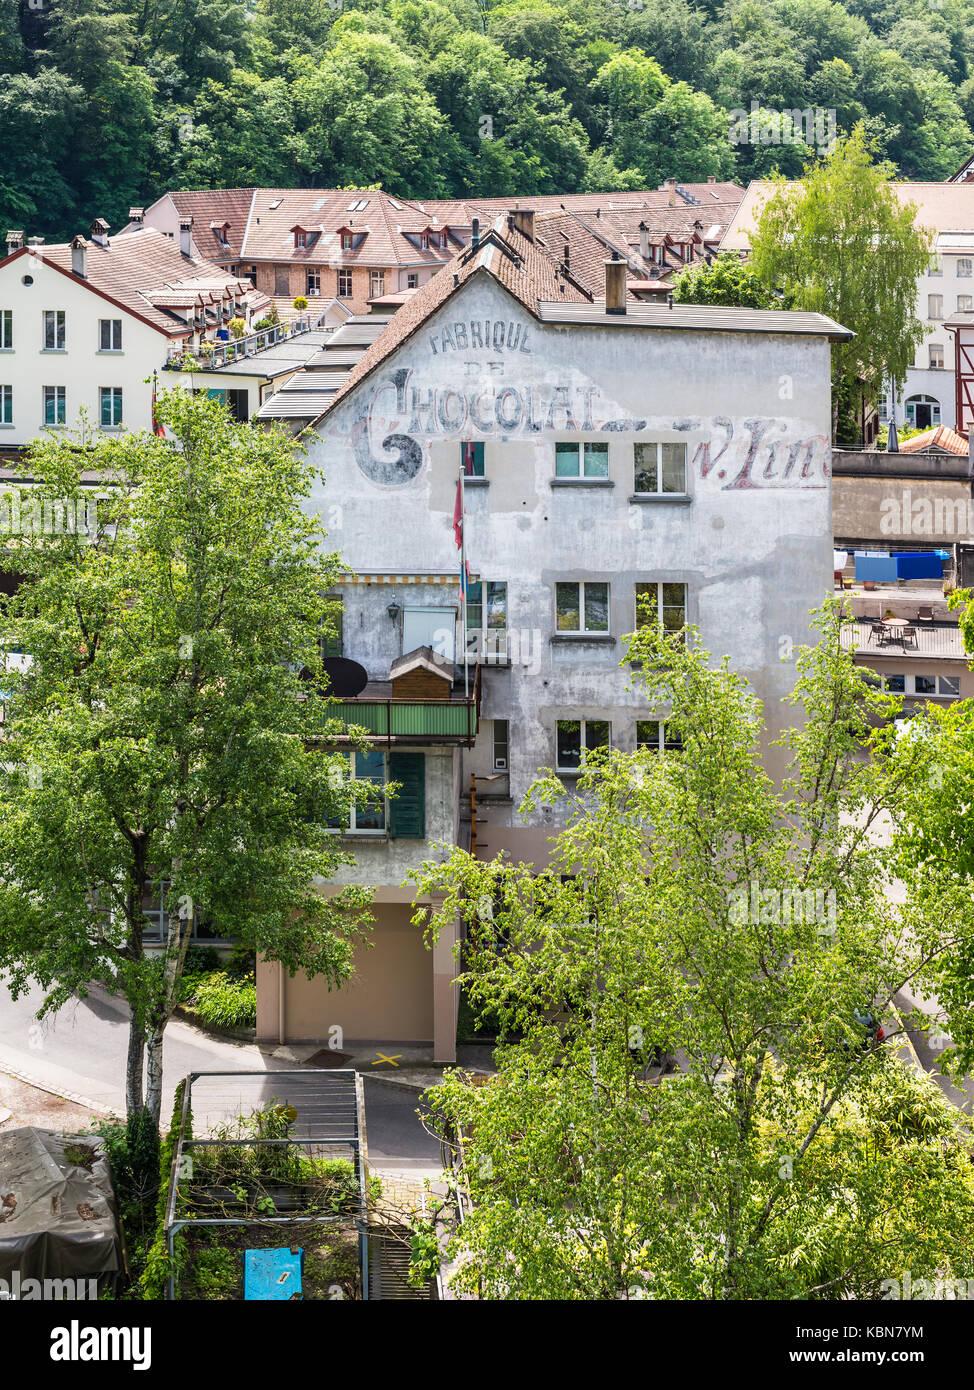 Bern, Switzerland - May 26, 2016: The original Lindt Chocolate factory in Bern, Switzerland. Lindt is a Swiss chocolatier Stock Photo